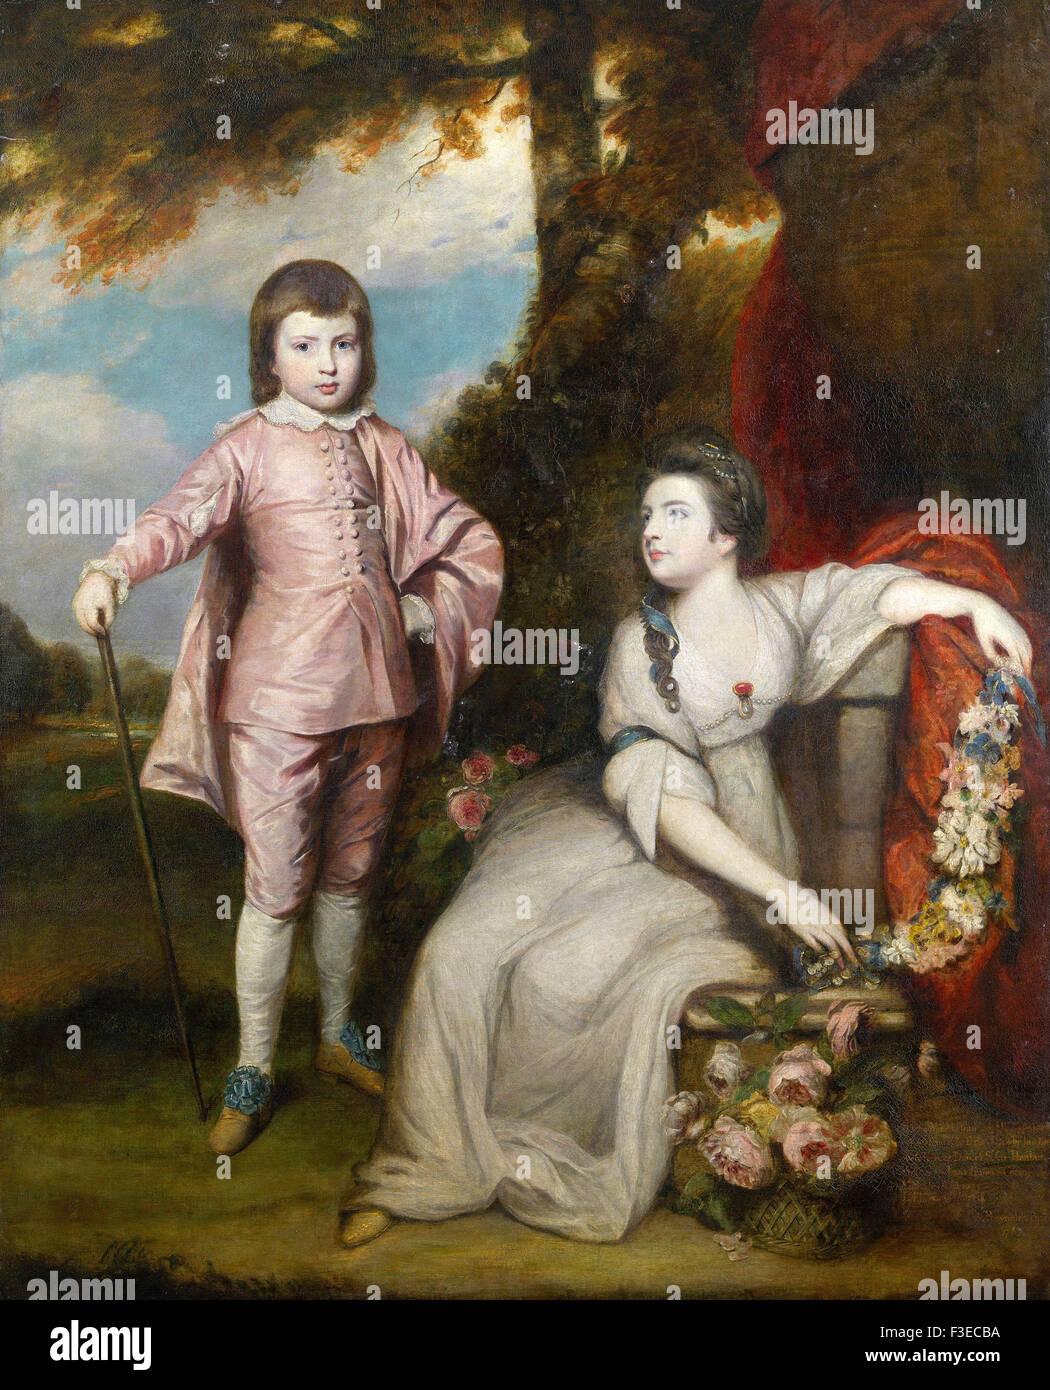 Sir Joshua Reynolds - George Capel, Viscount Malden and Lady Elizabeth Capel - Stock Image